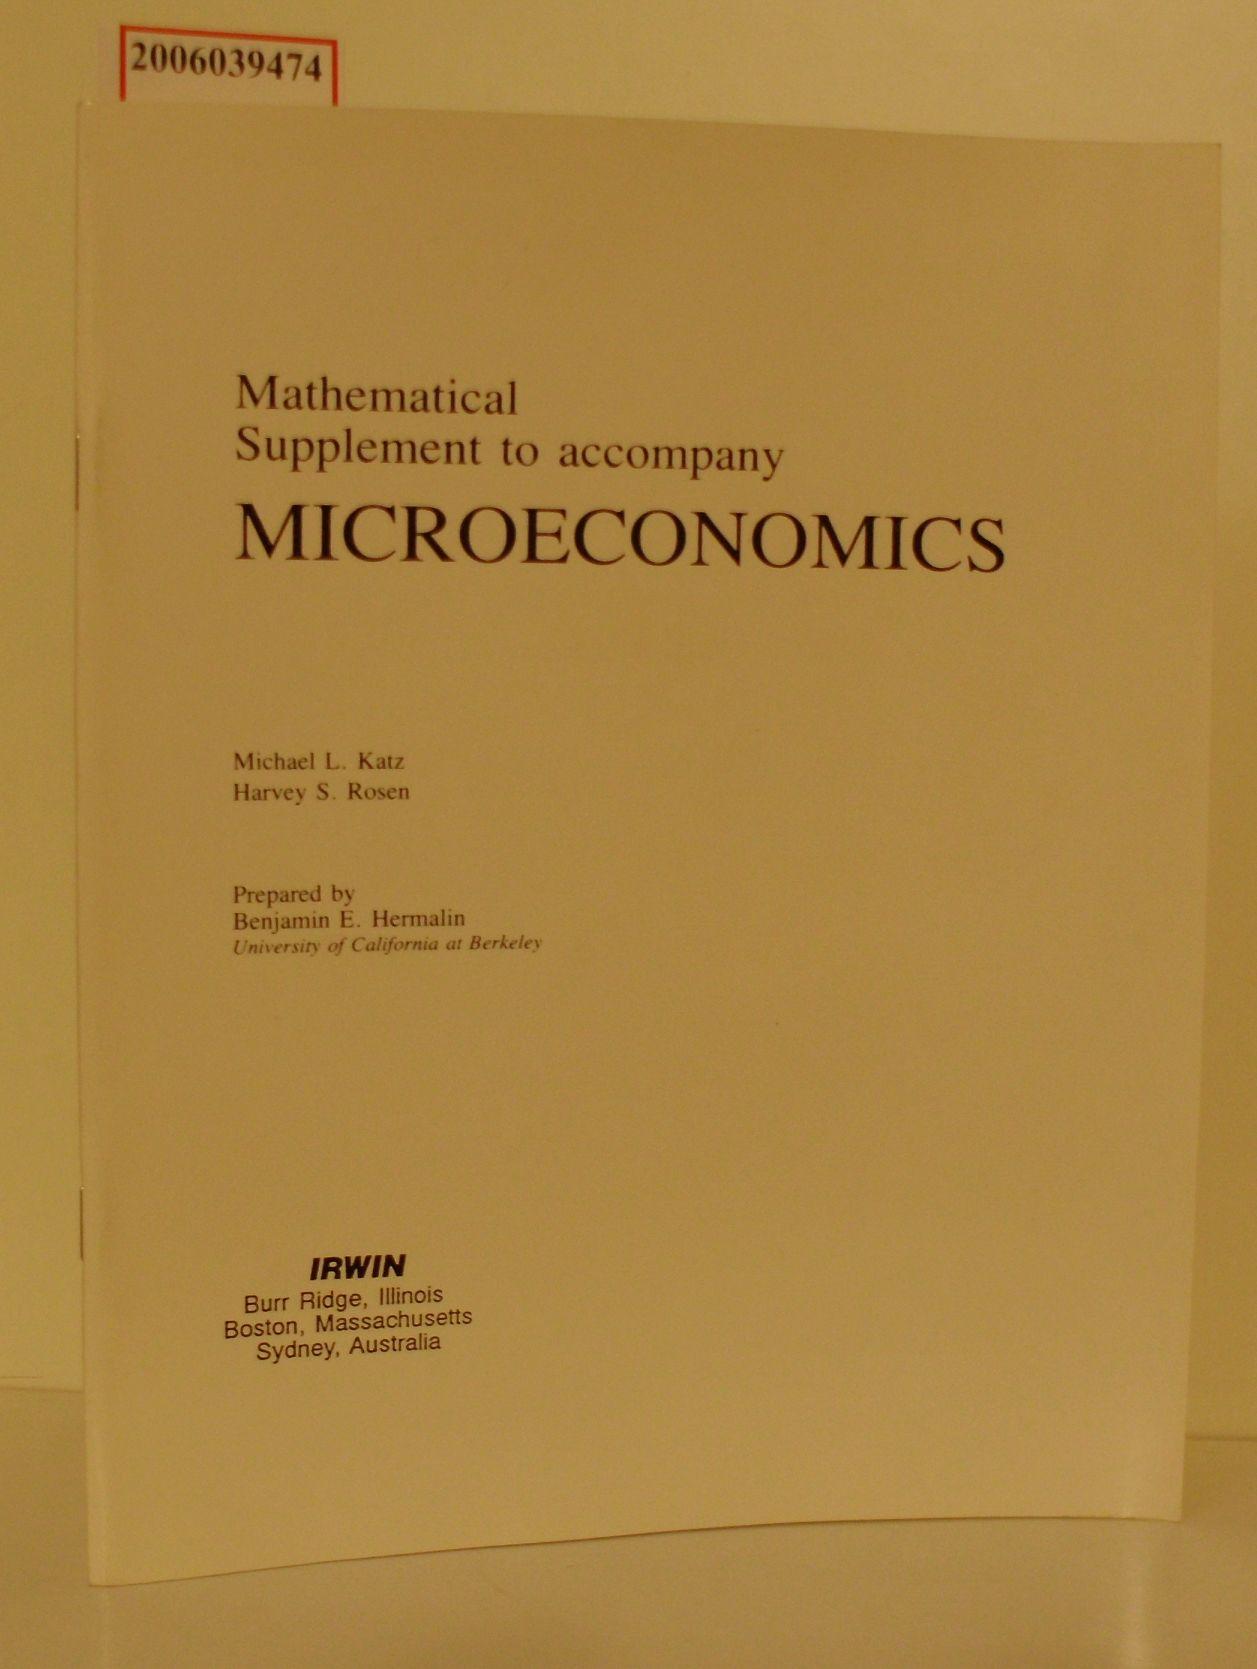 Mathematical Supplement to accompany MICROECONOMICS